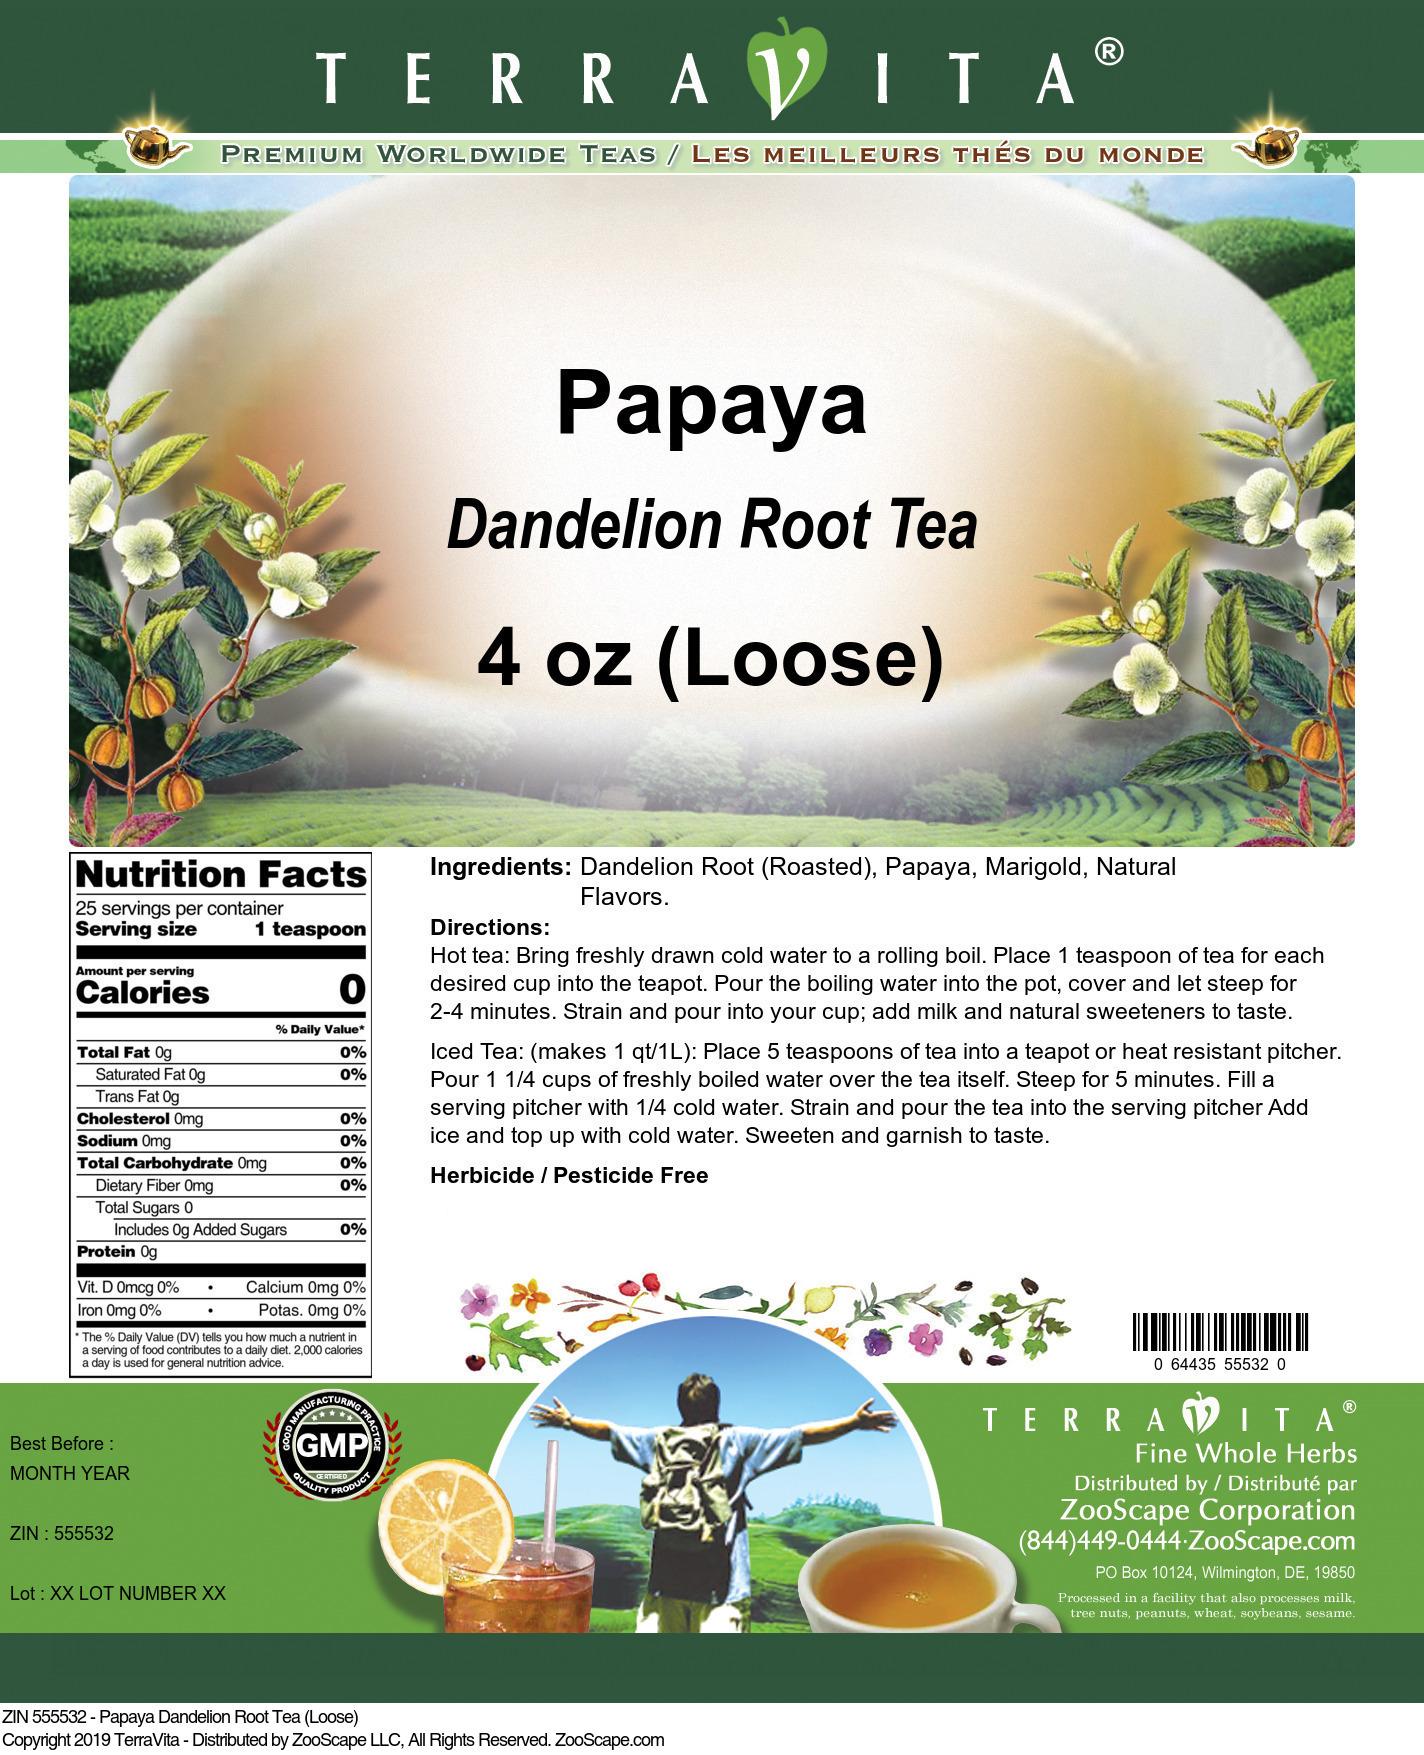 Papaya Dandelion Root Tea (Loose)